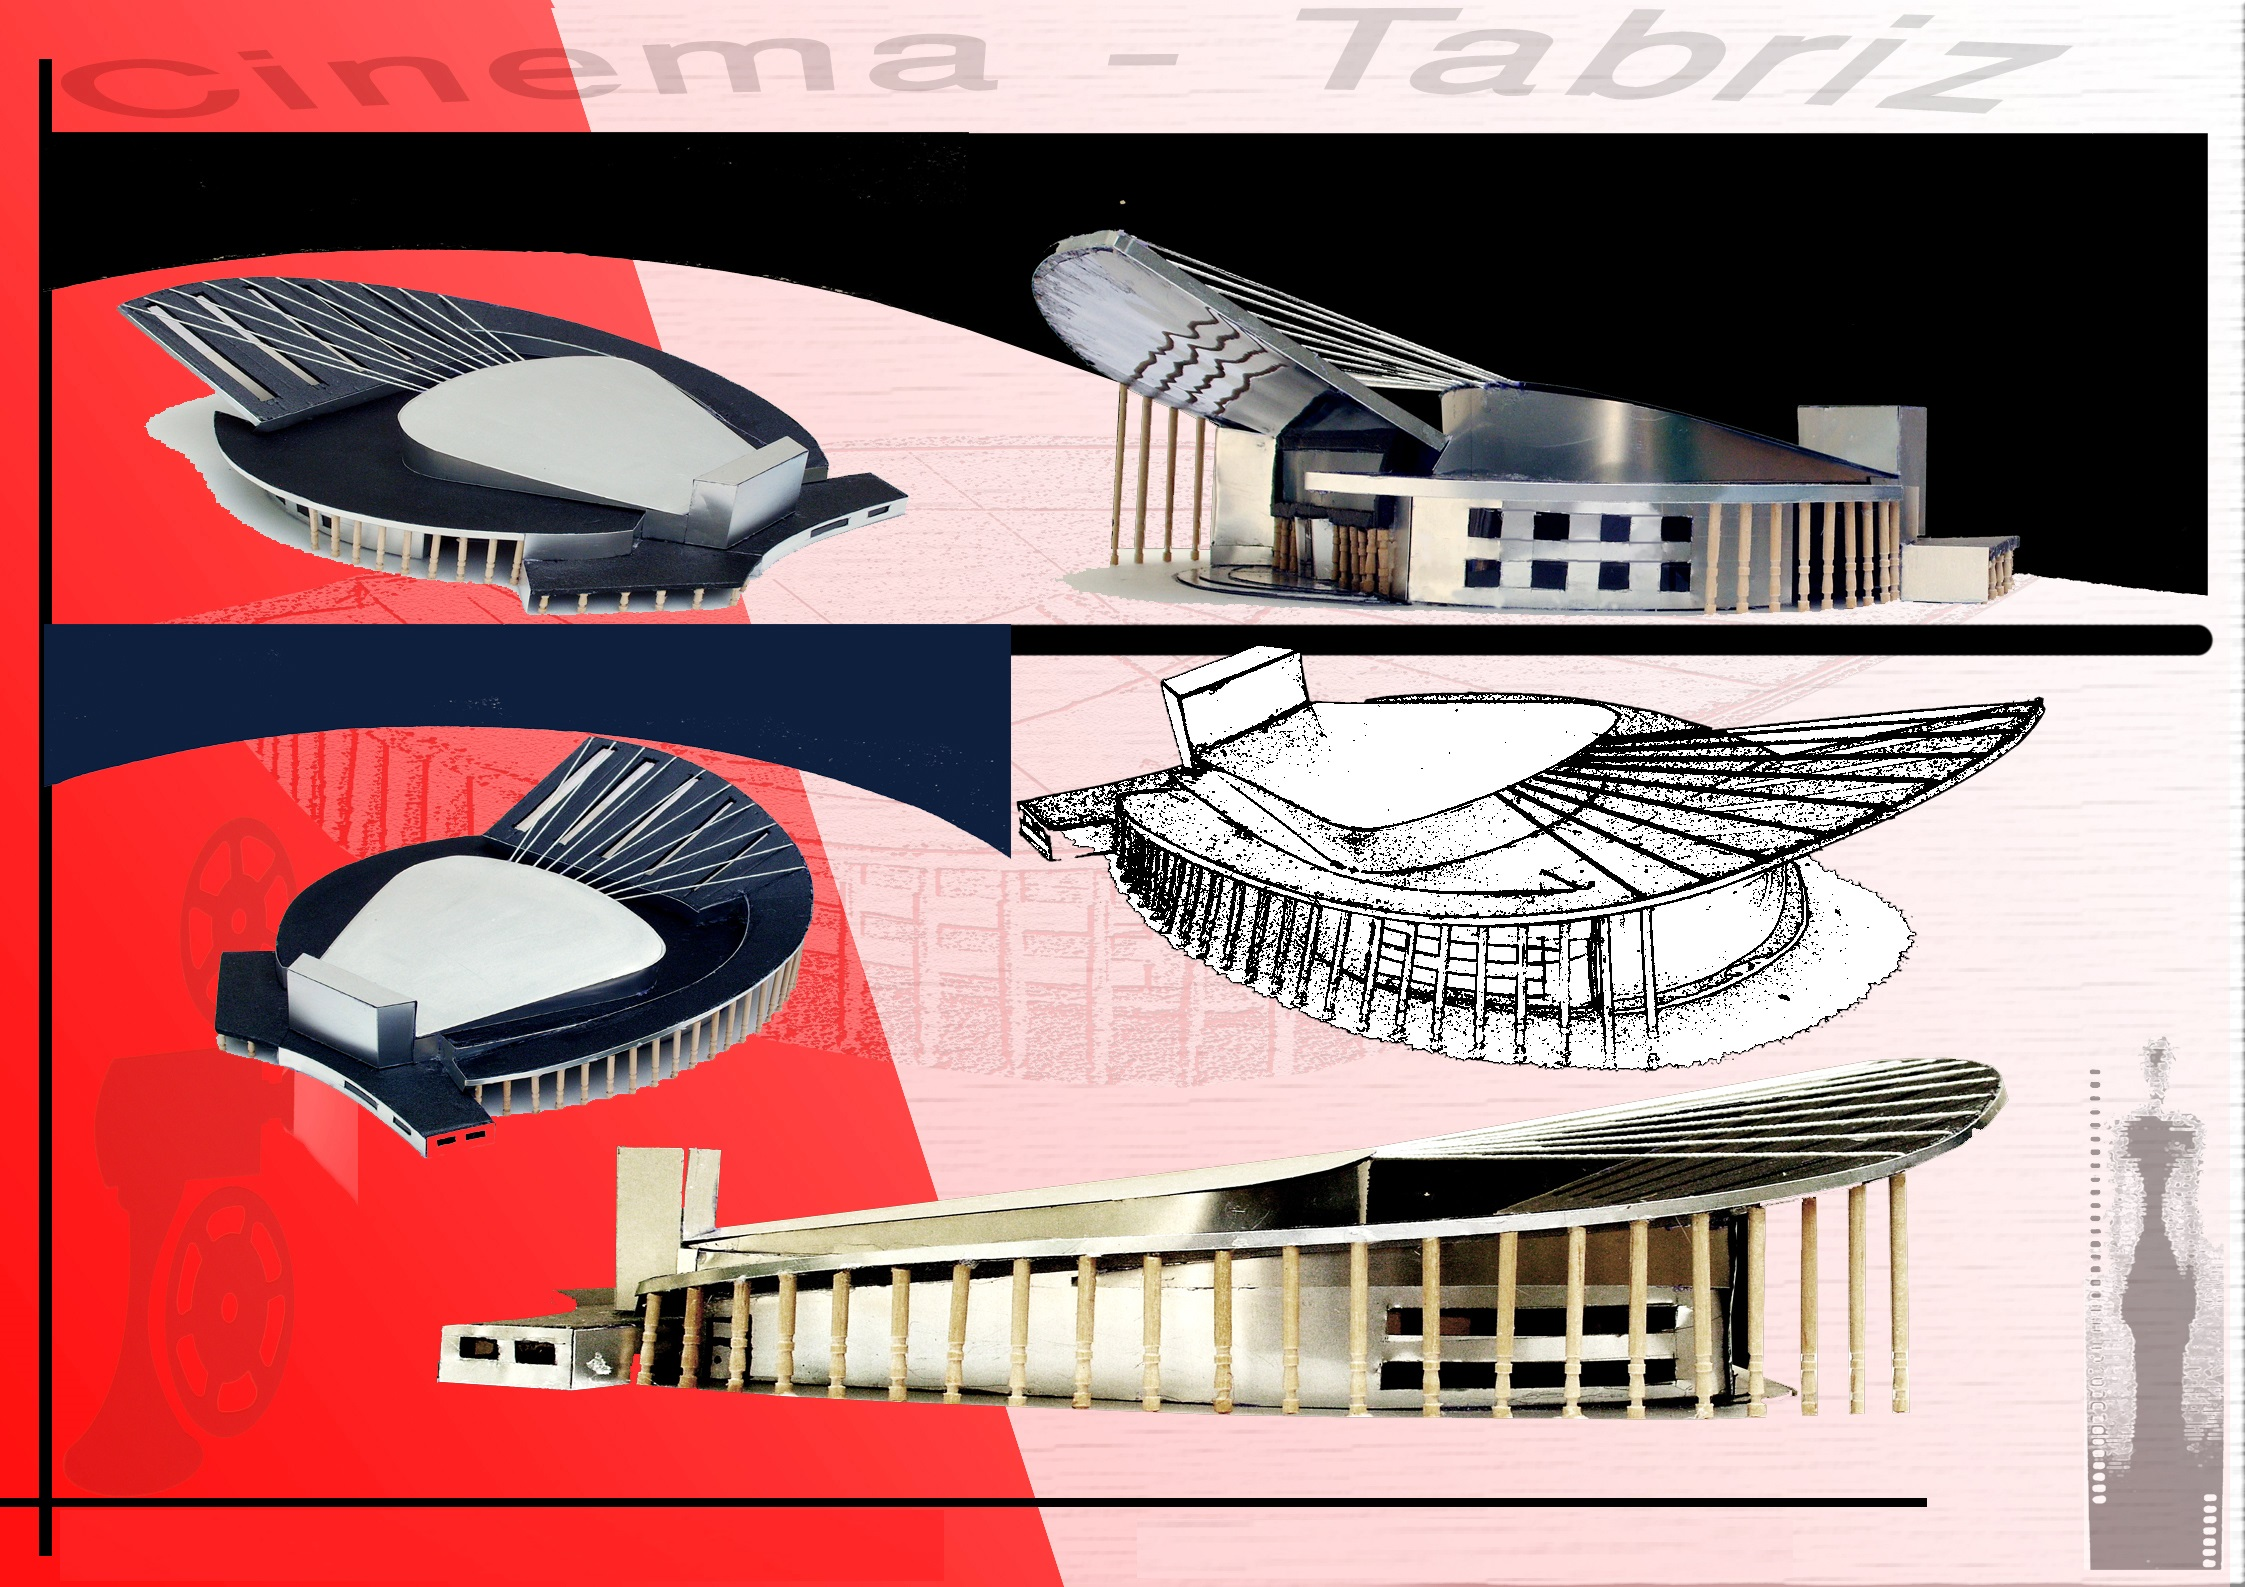 دانلود پاورپوینت معماری دینامیک